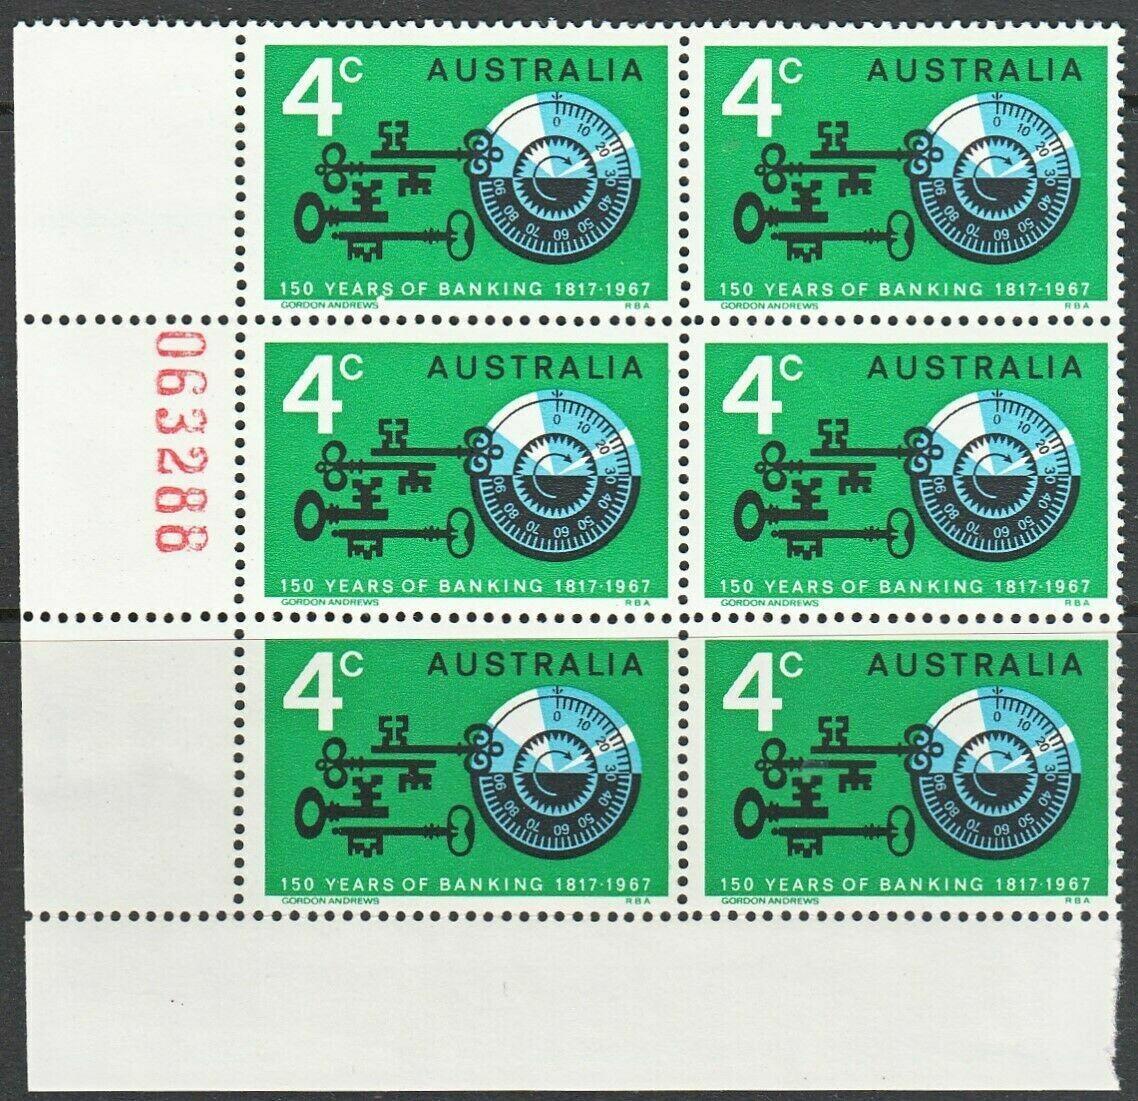 Australia 1967 4c Banking Sheet Number Block of 6 with Two Varieties MUH